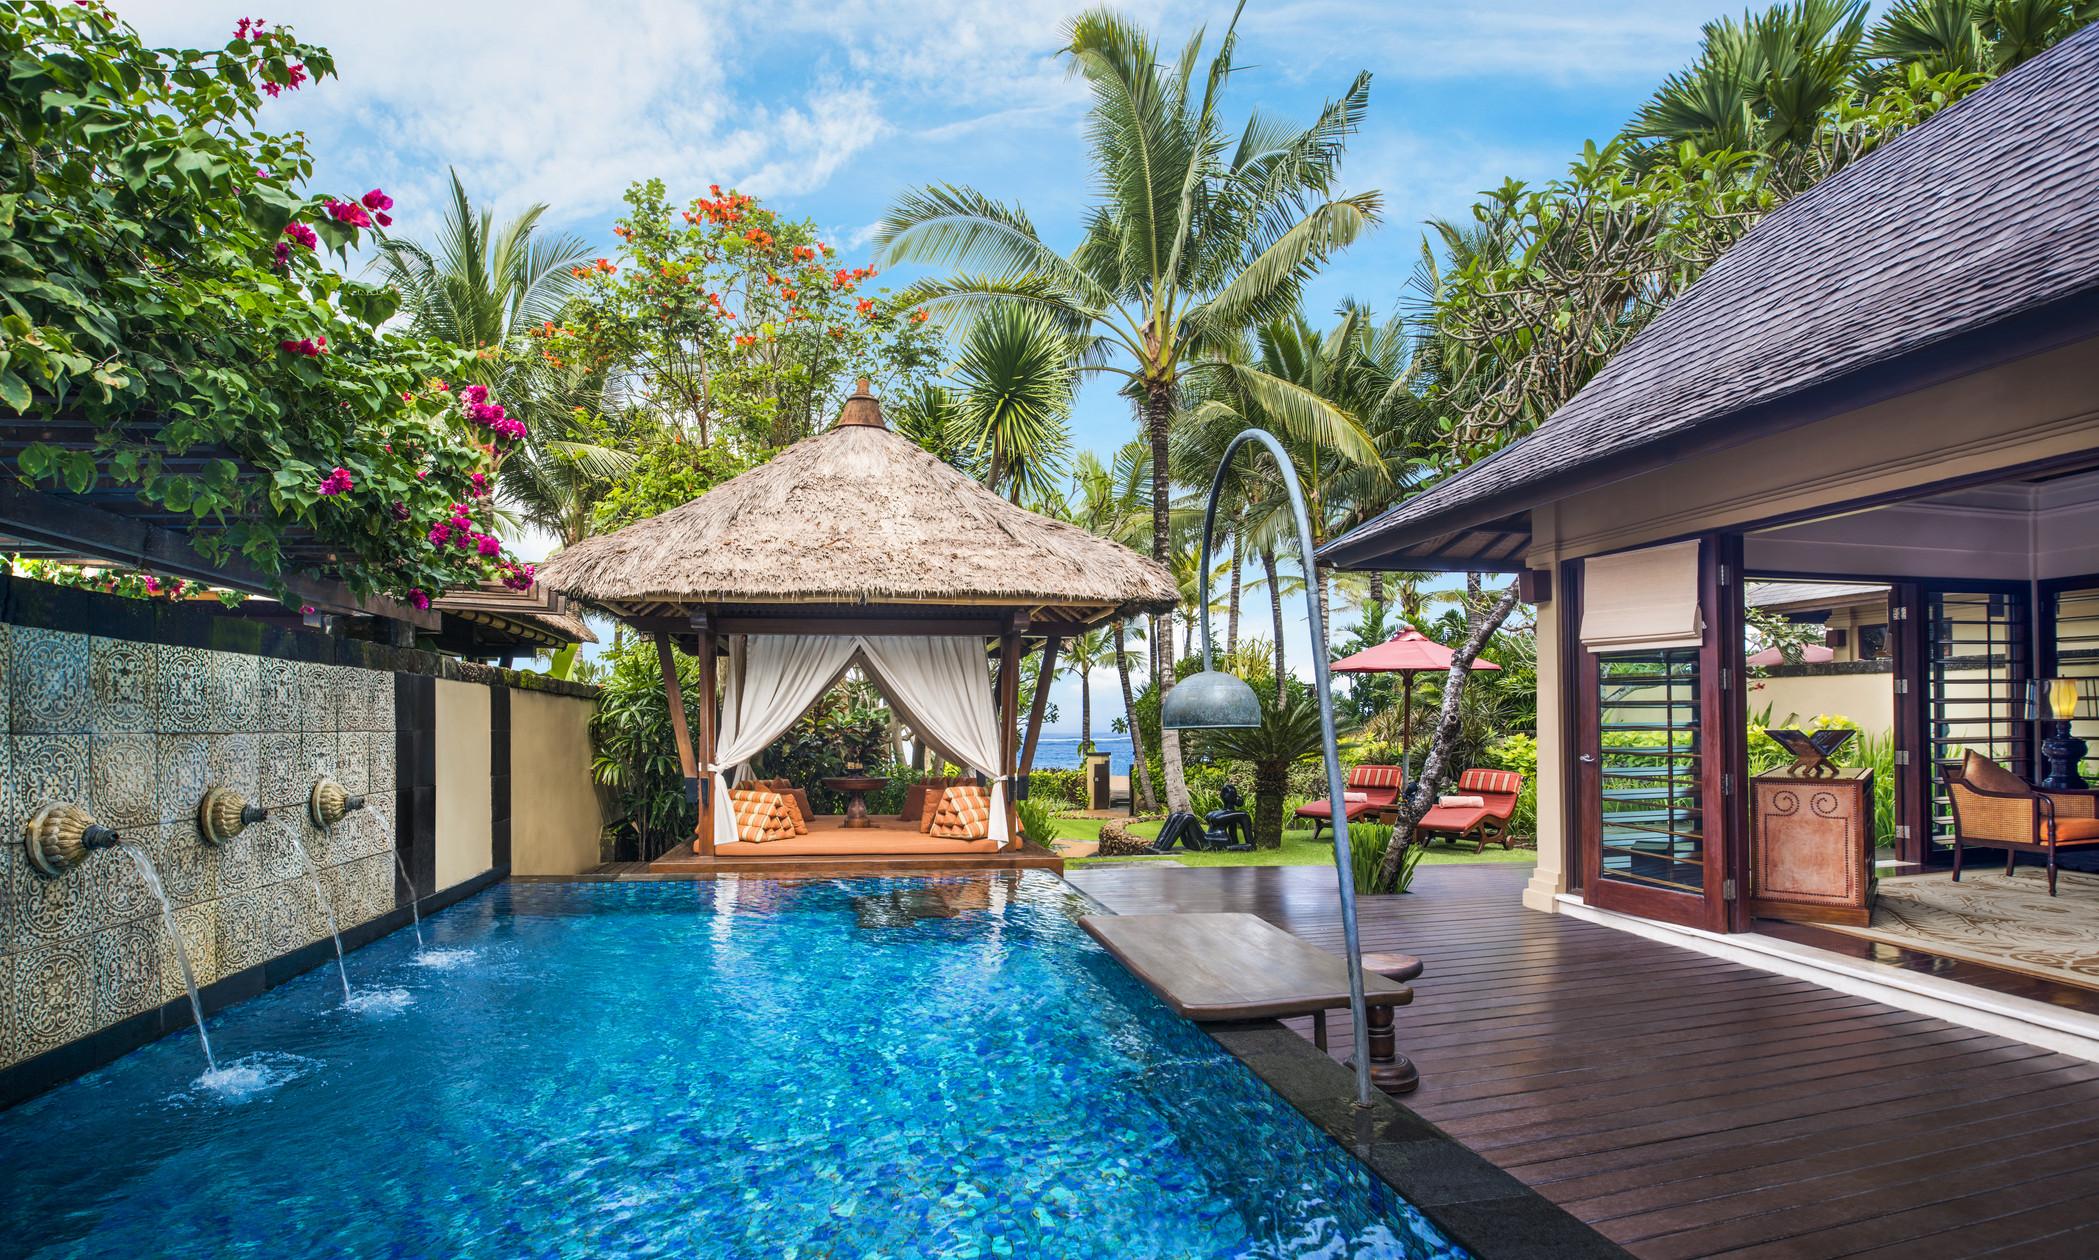 St Regis Bali The Strand Villa_Private Pool and Gazebo at.jpg